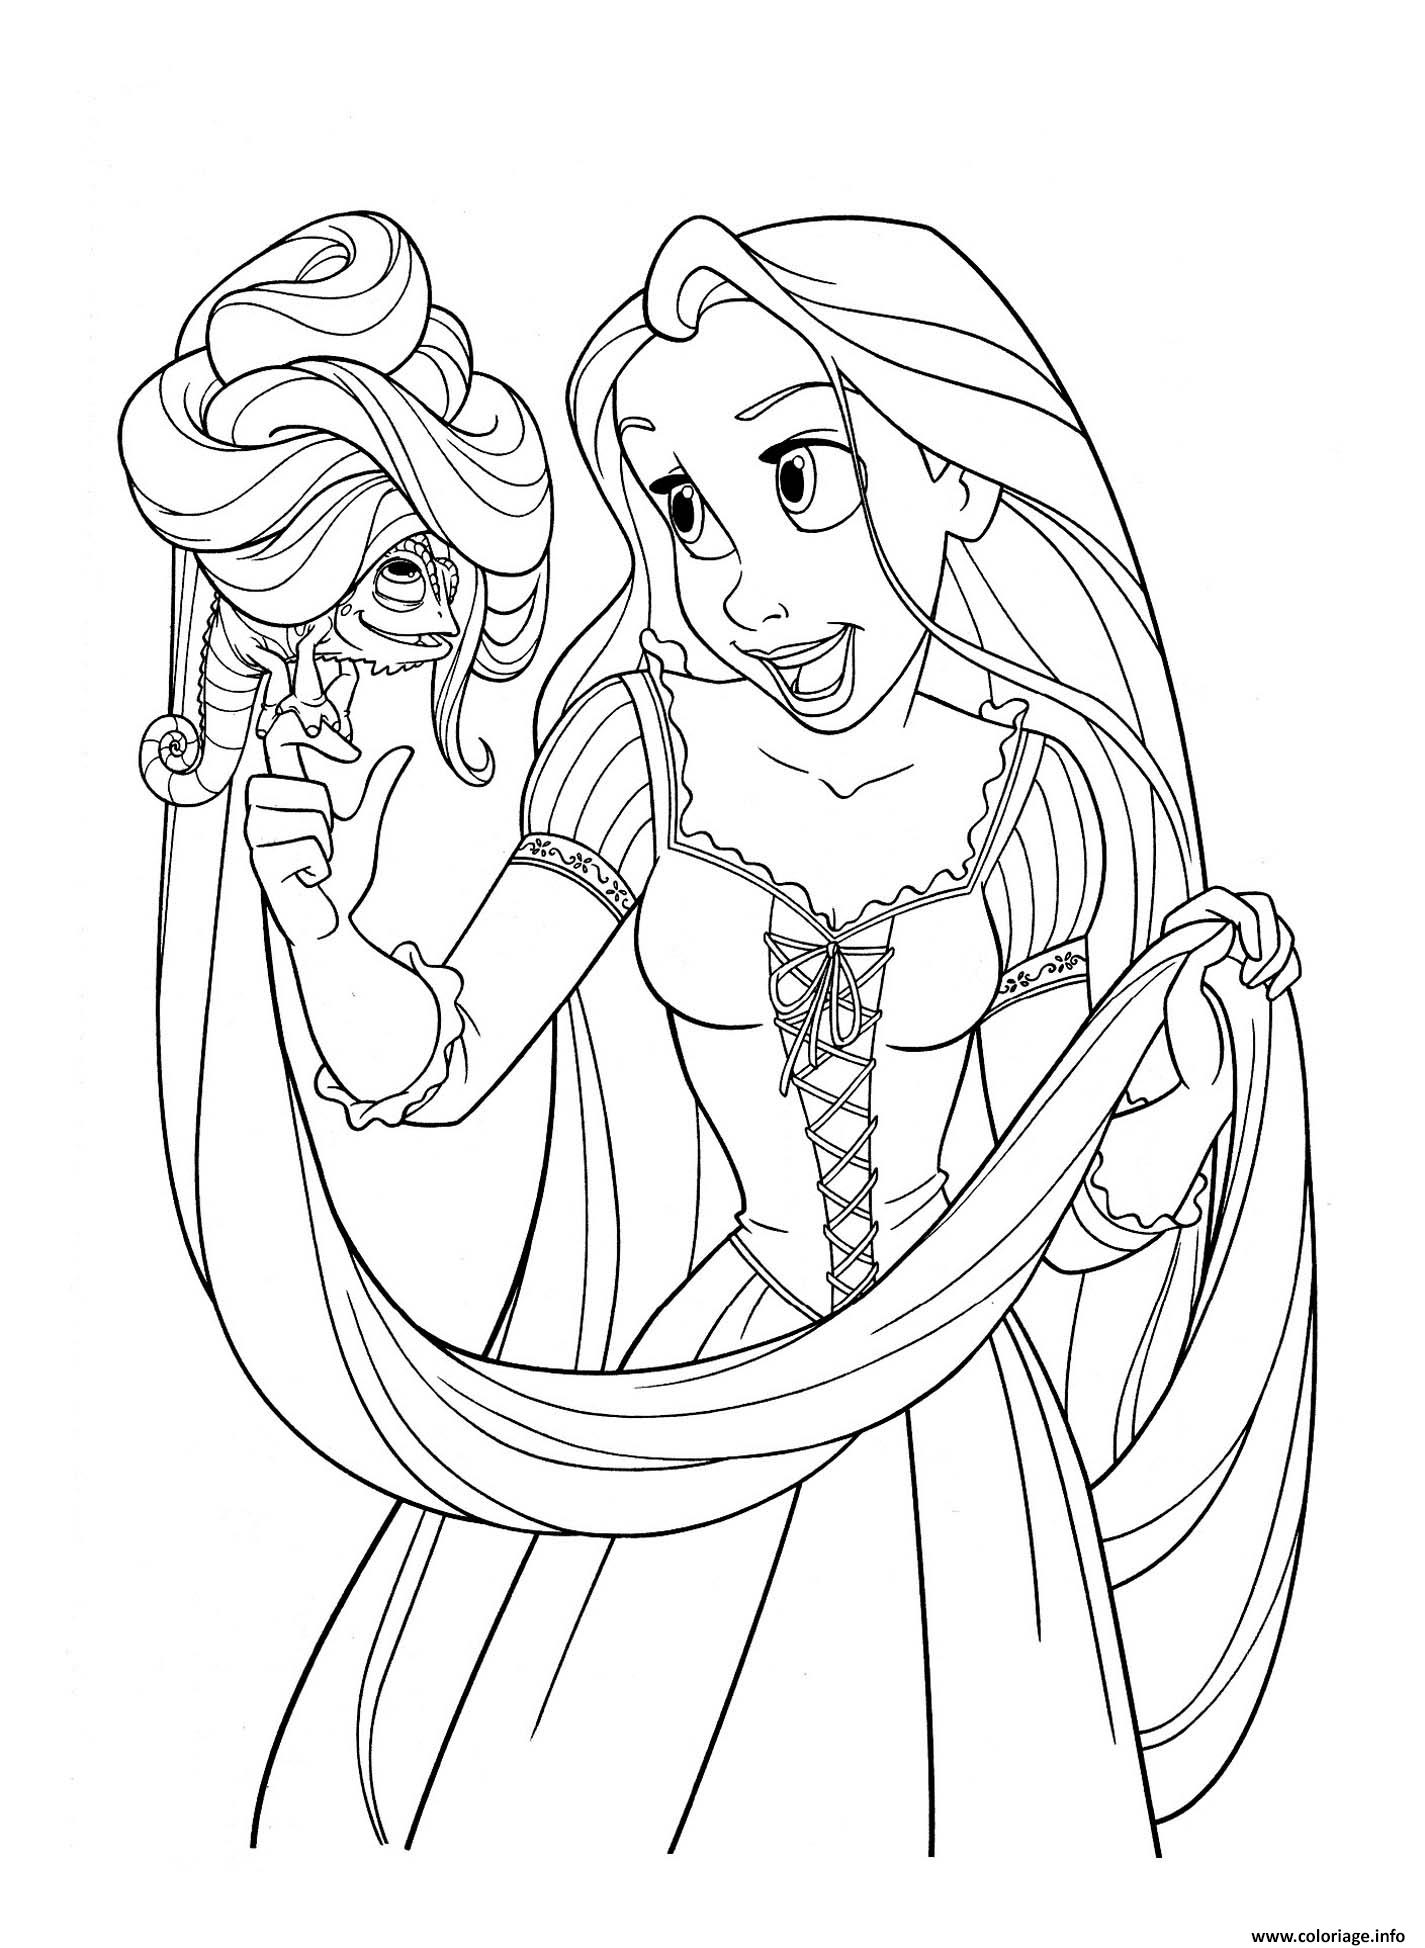 Coloriage raiponce princesse disney avec pascal dessin - Coloriage raiponce disney ...